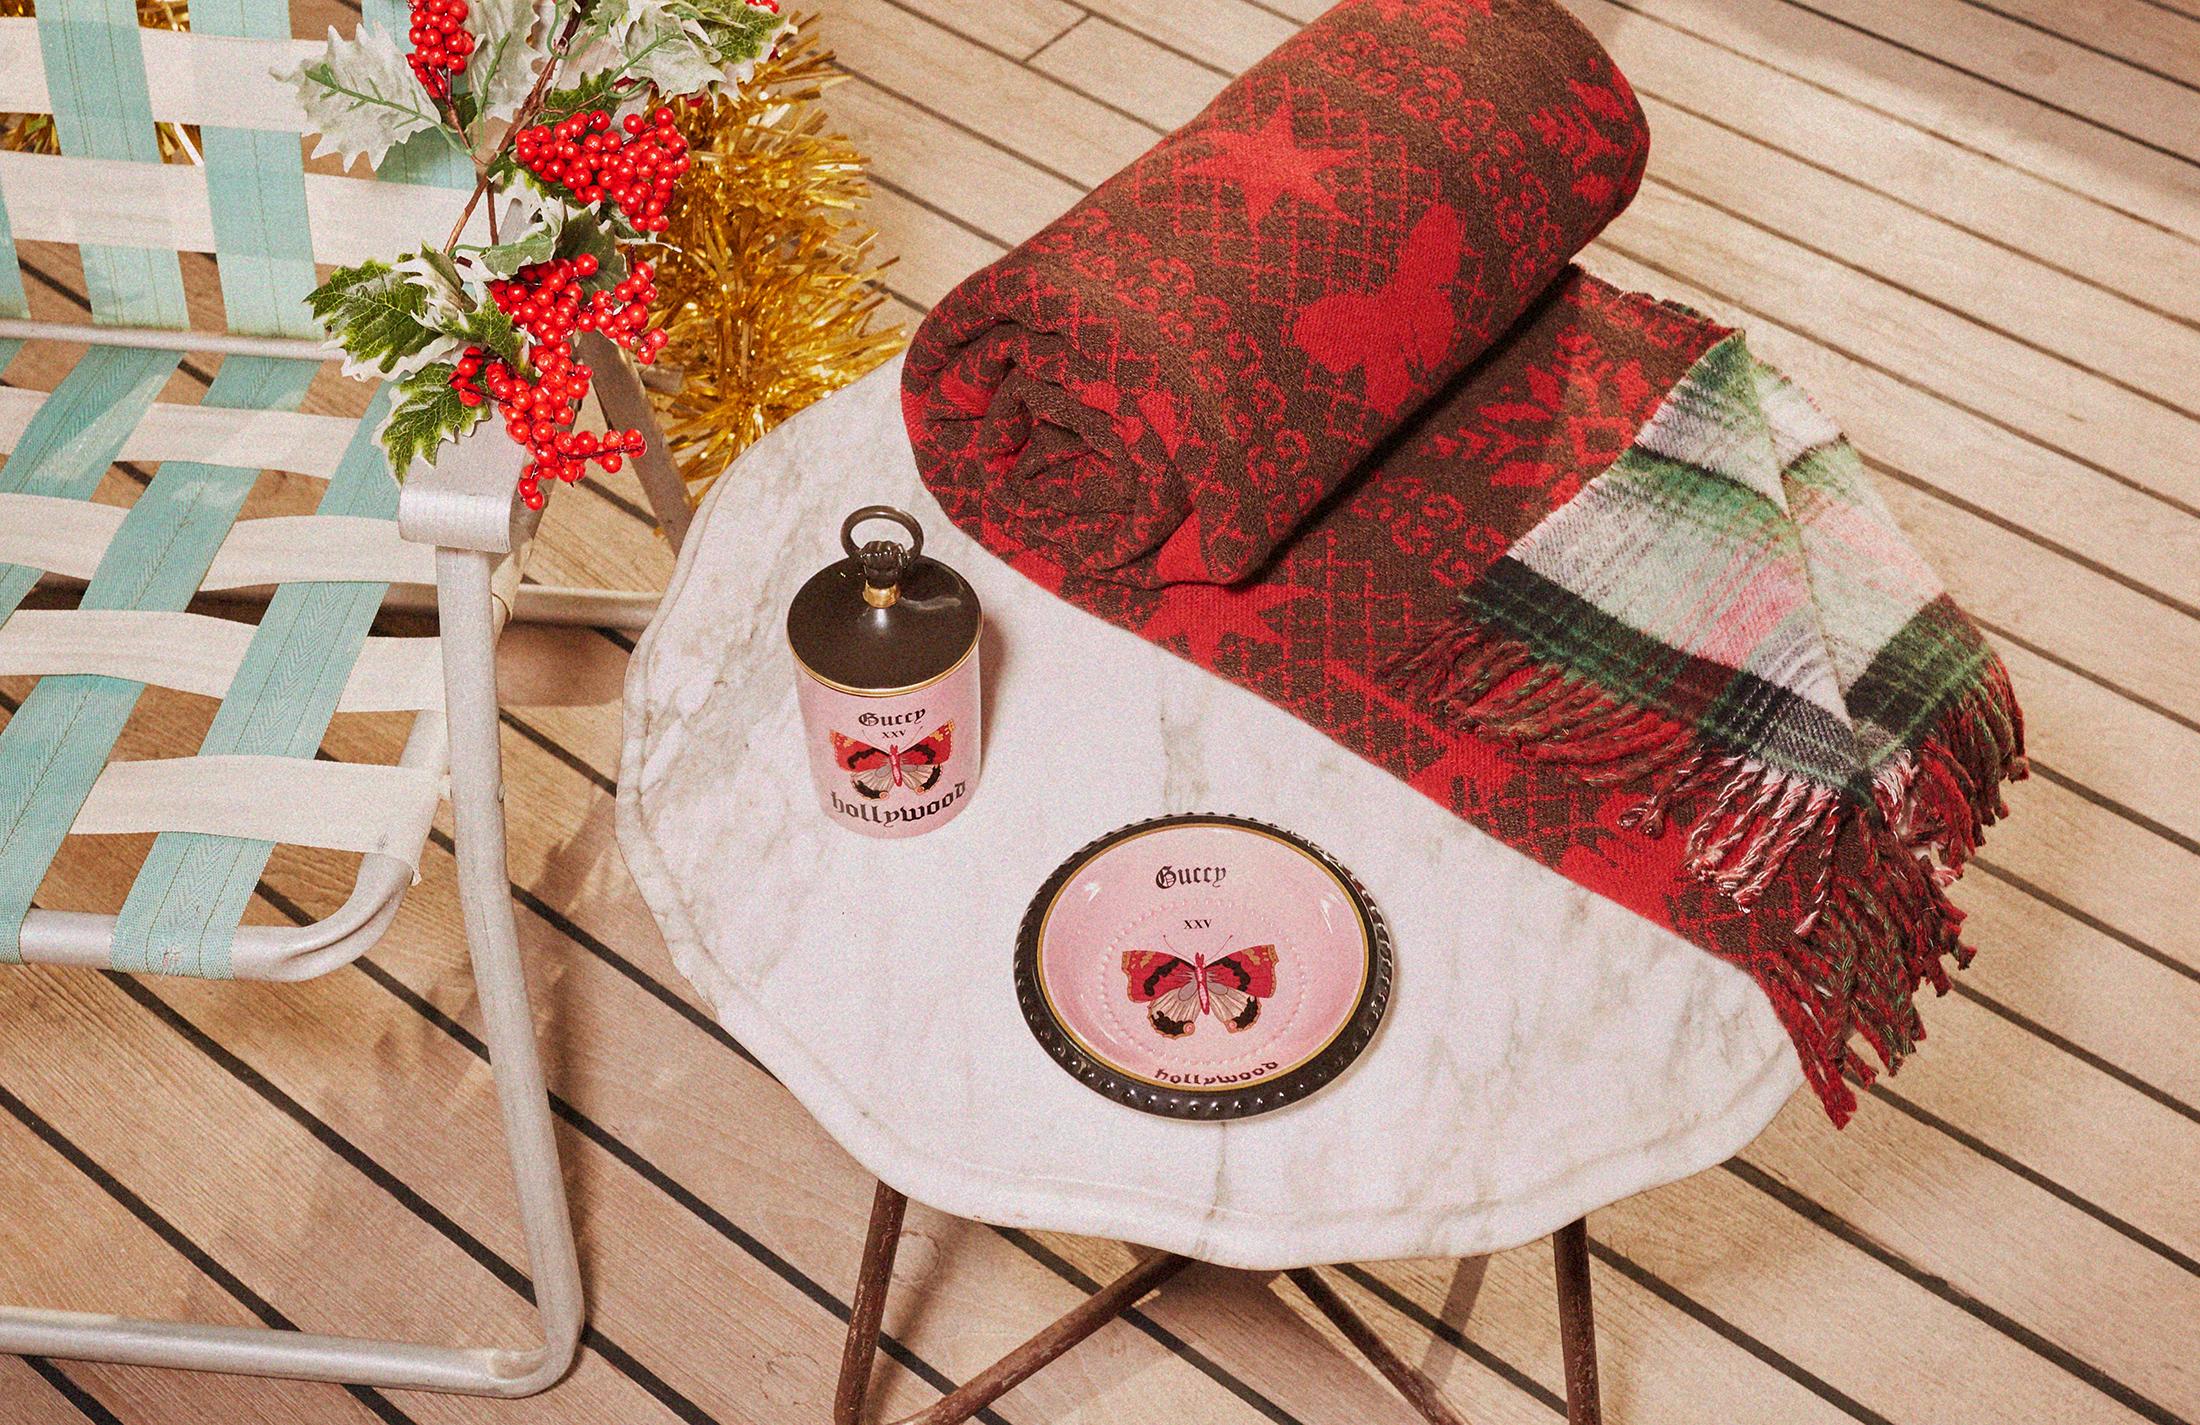 Gucci Holiday 2019 Ad Campaign by Harmony Korine